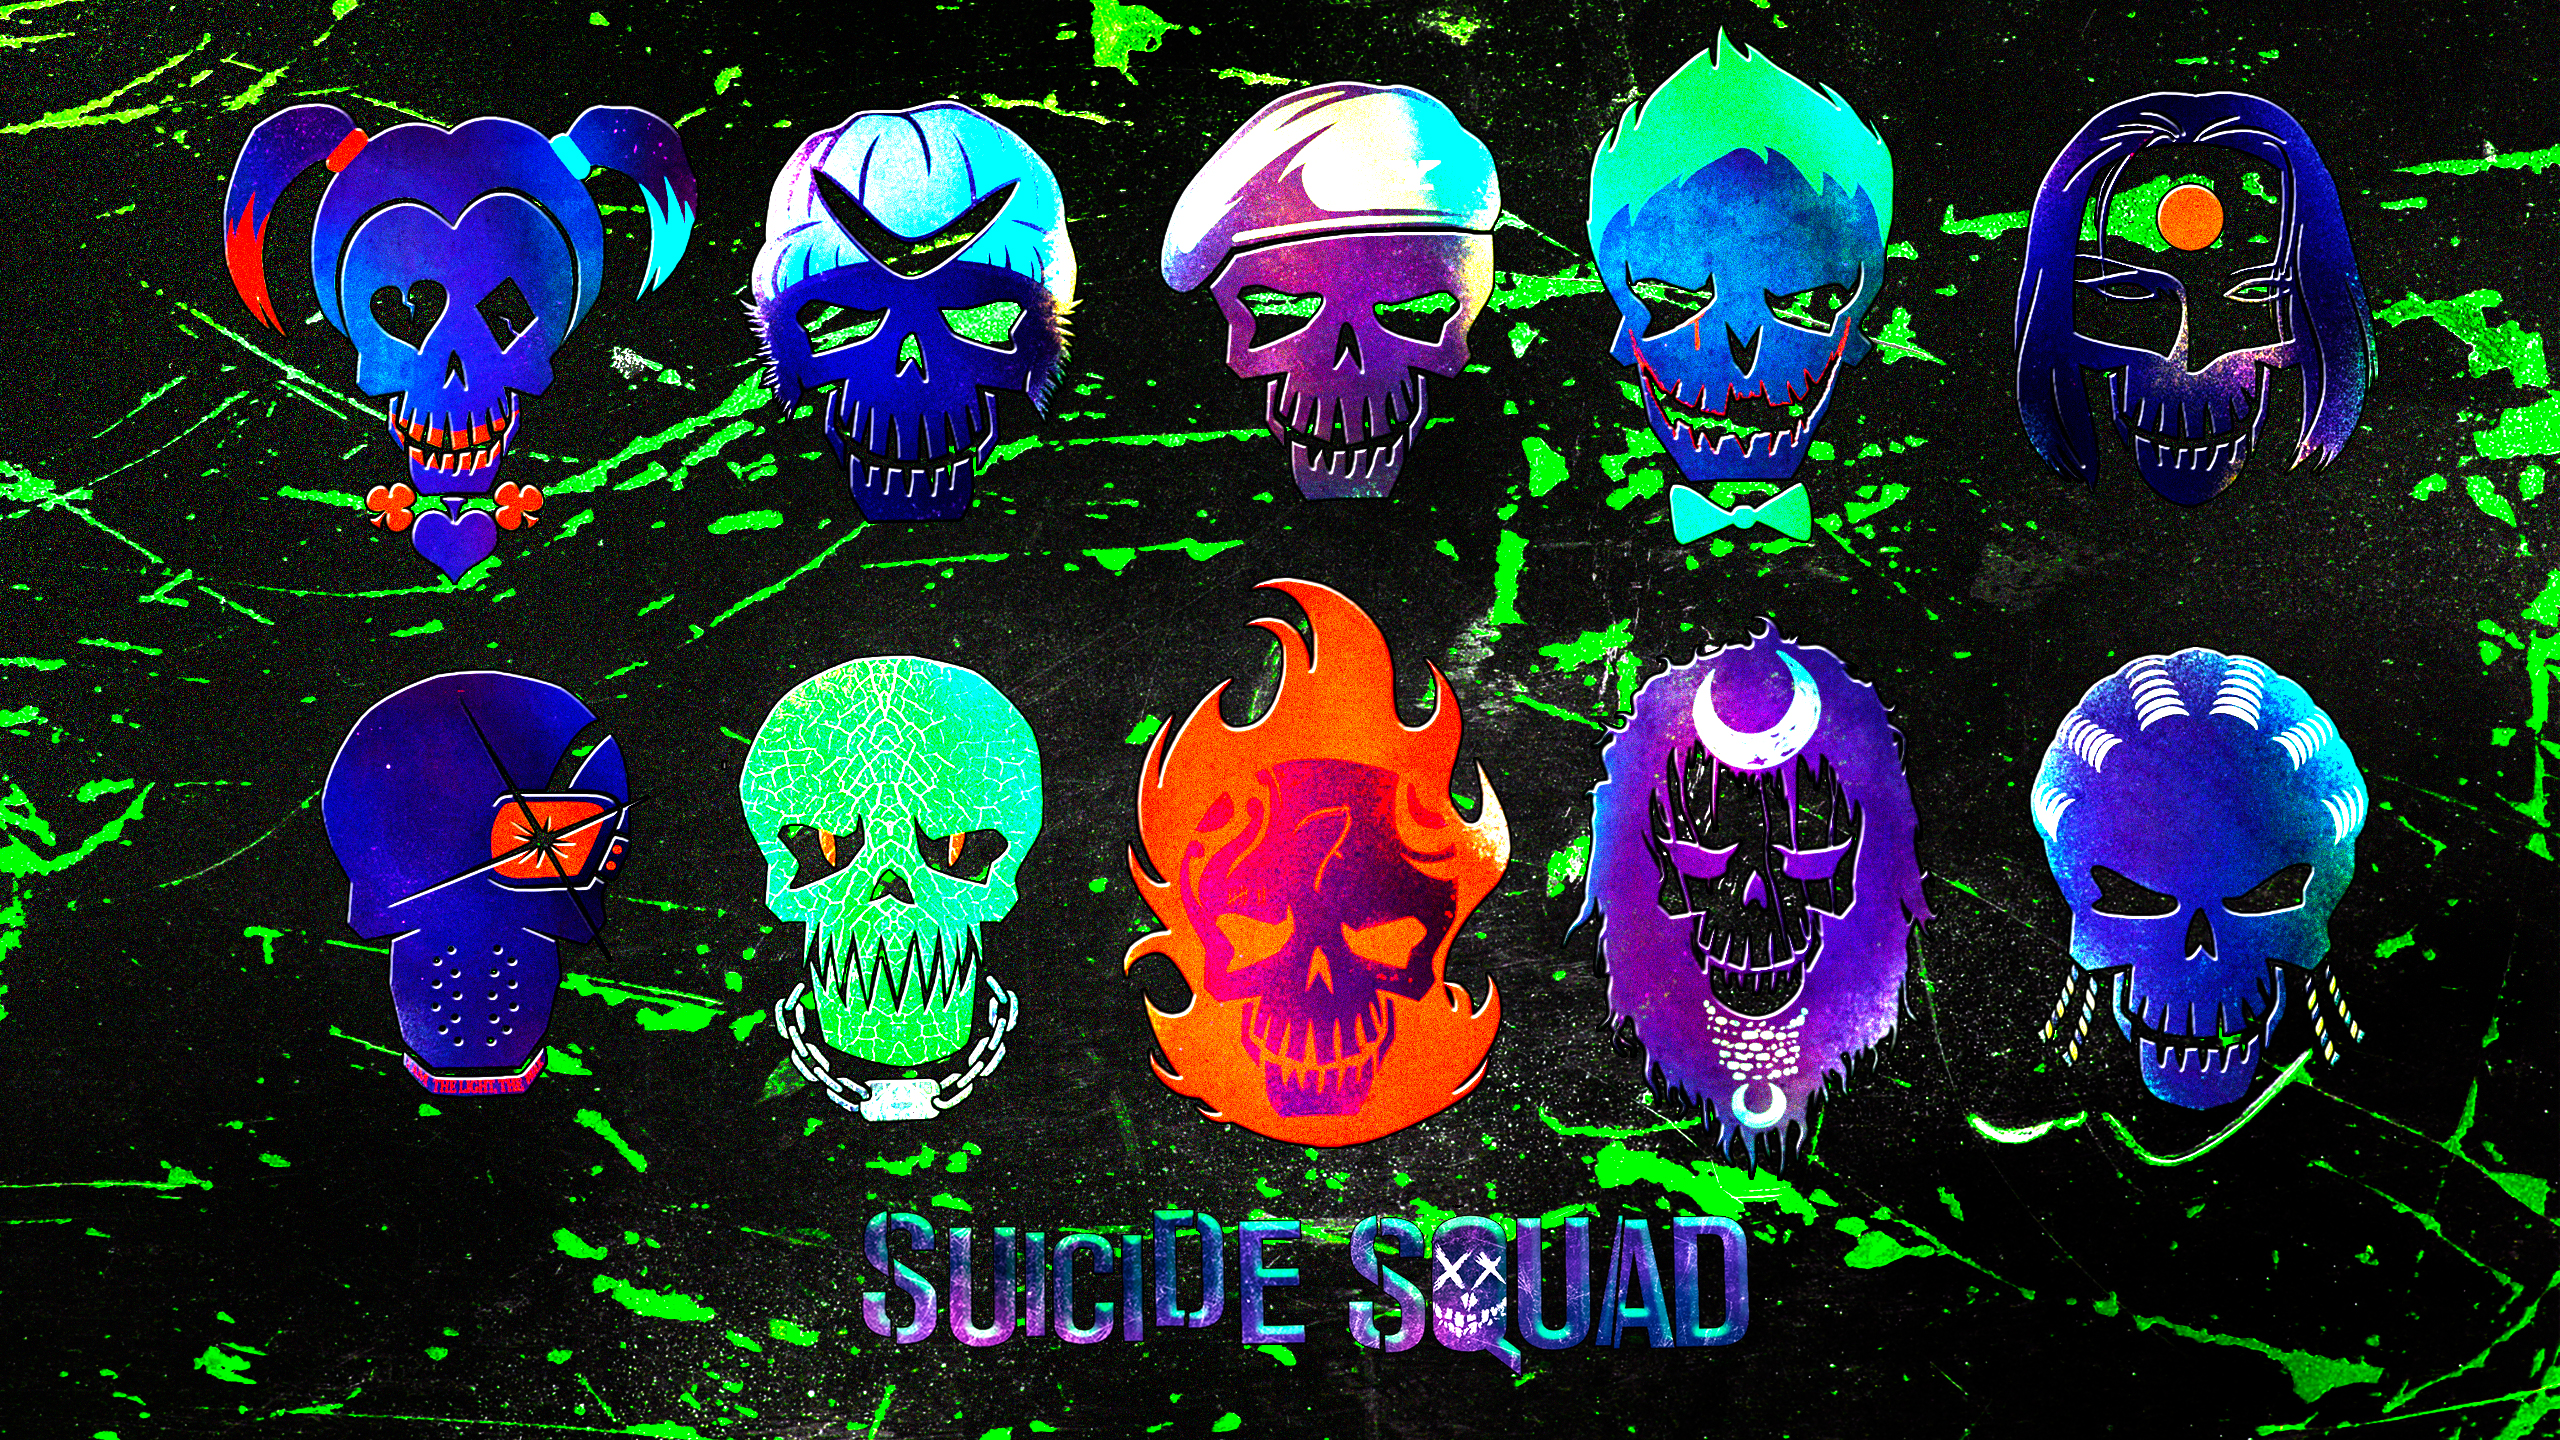 Suicide Squad Wallpaper By AlexLannister On DeviantArt